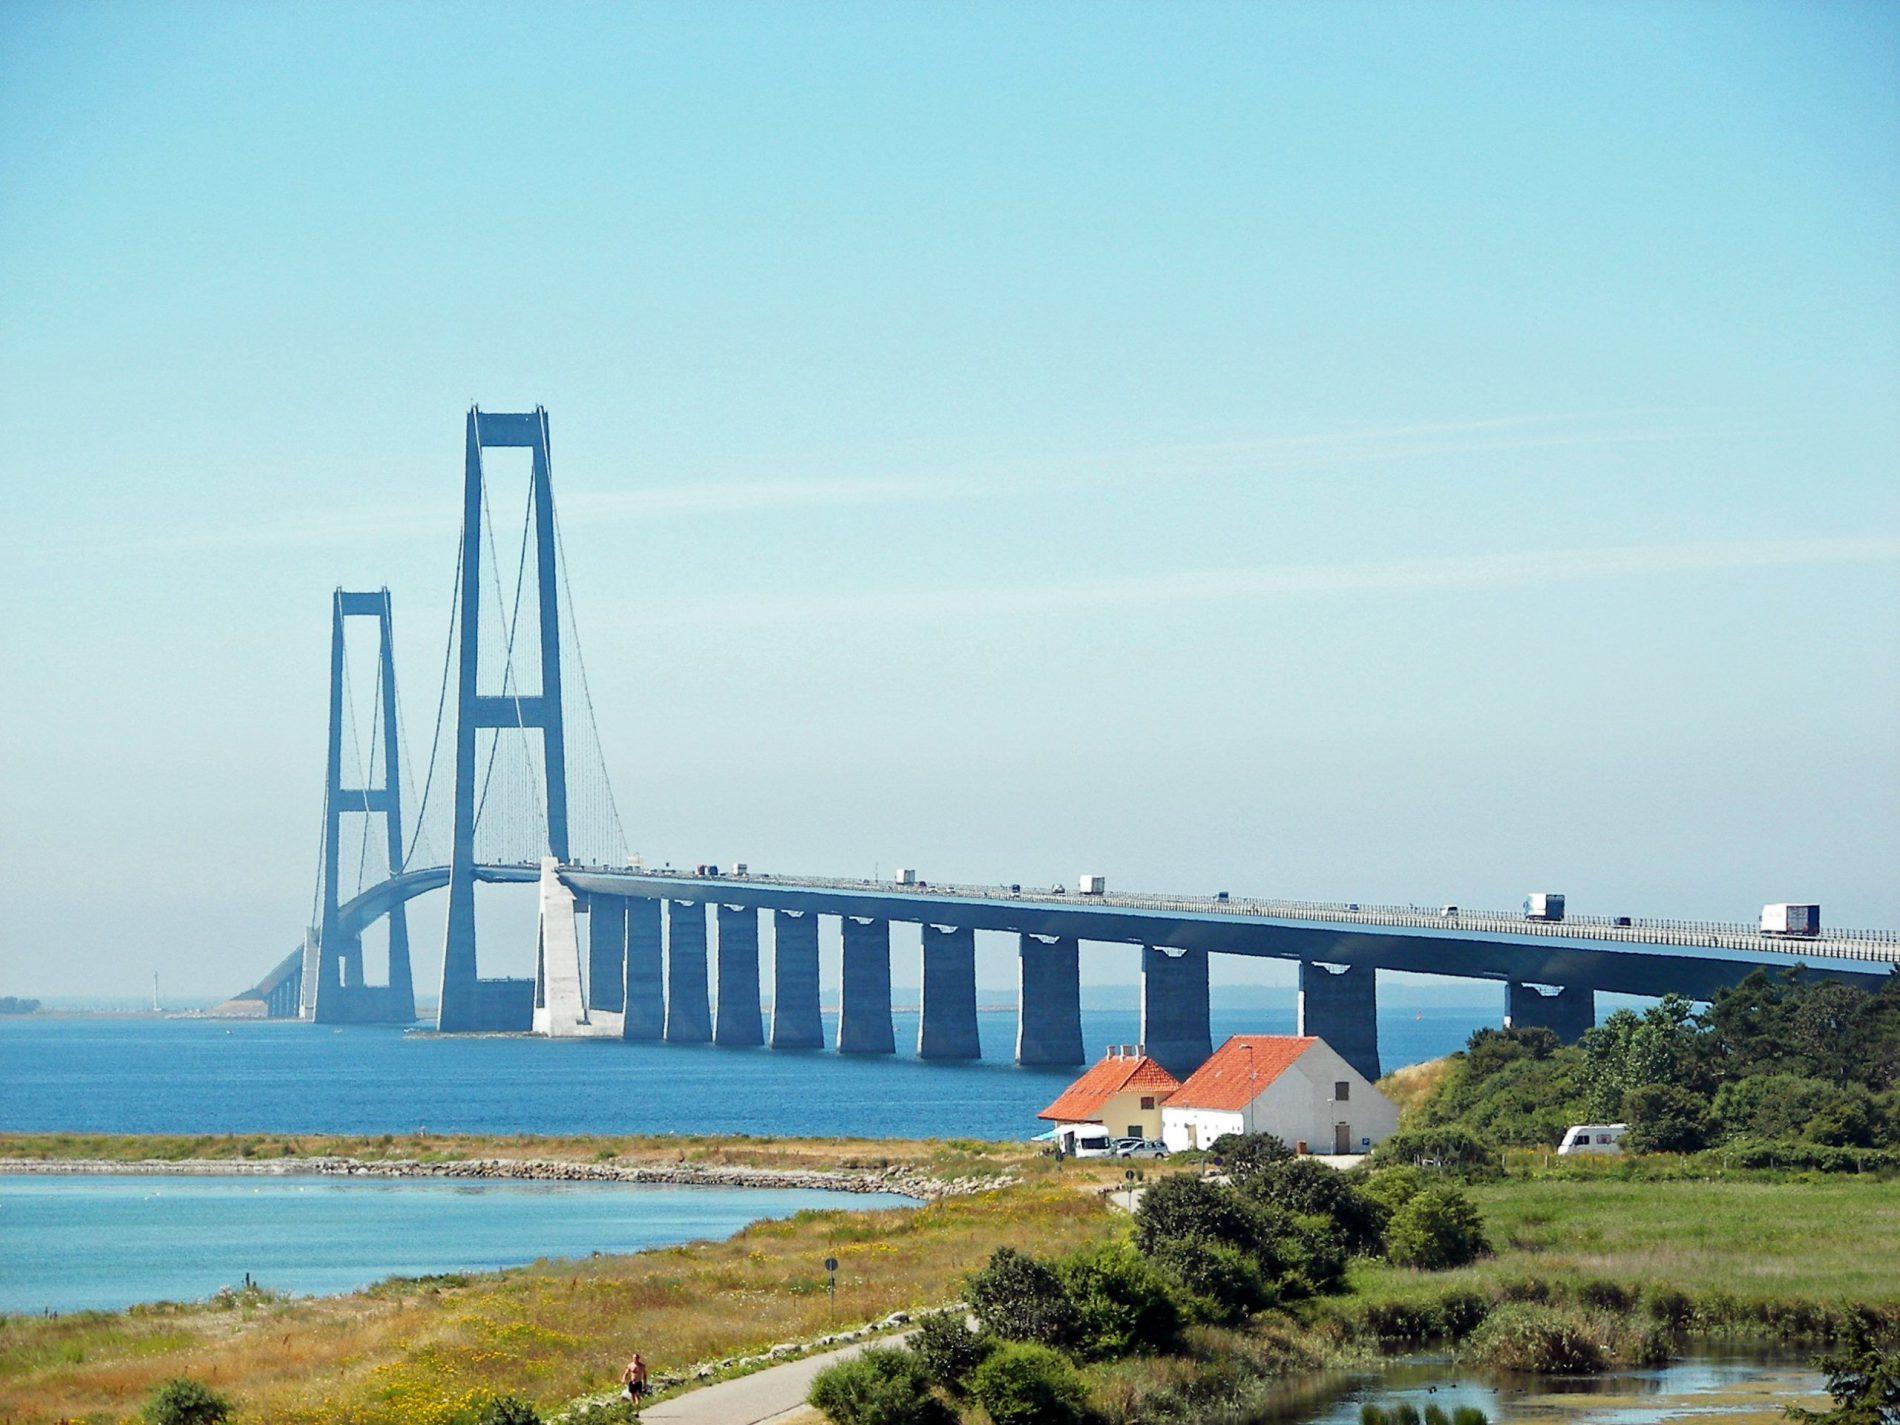 Großer Belt Brücke Storebæltsbroen in Seeland, Dänemark